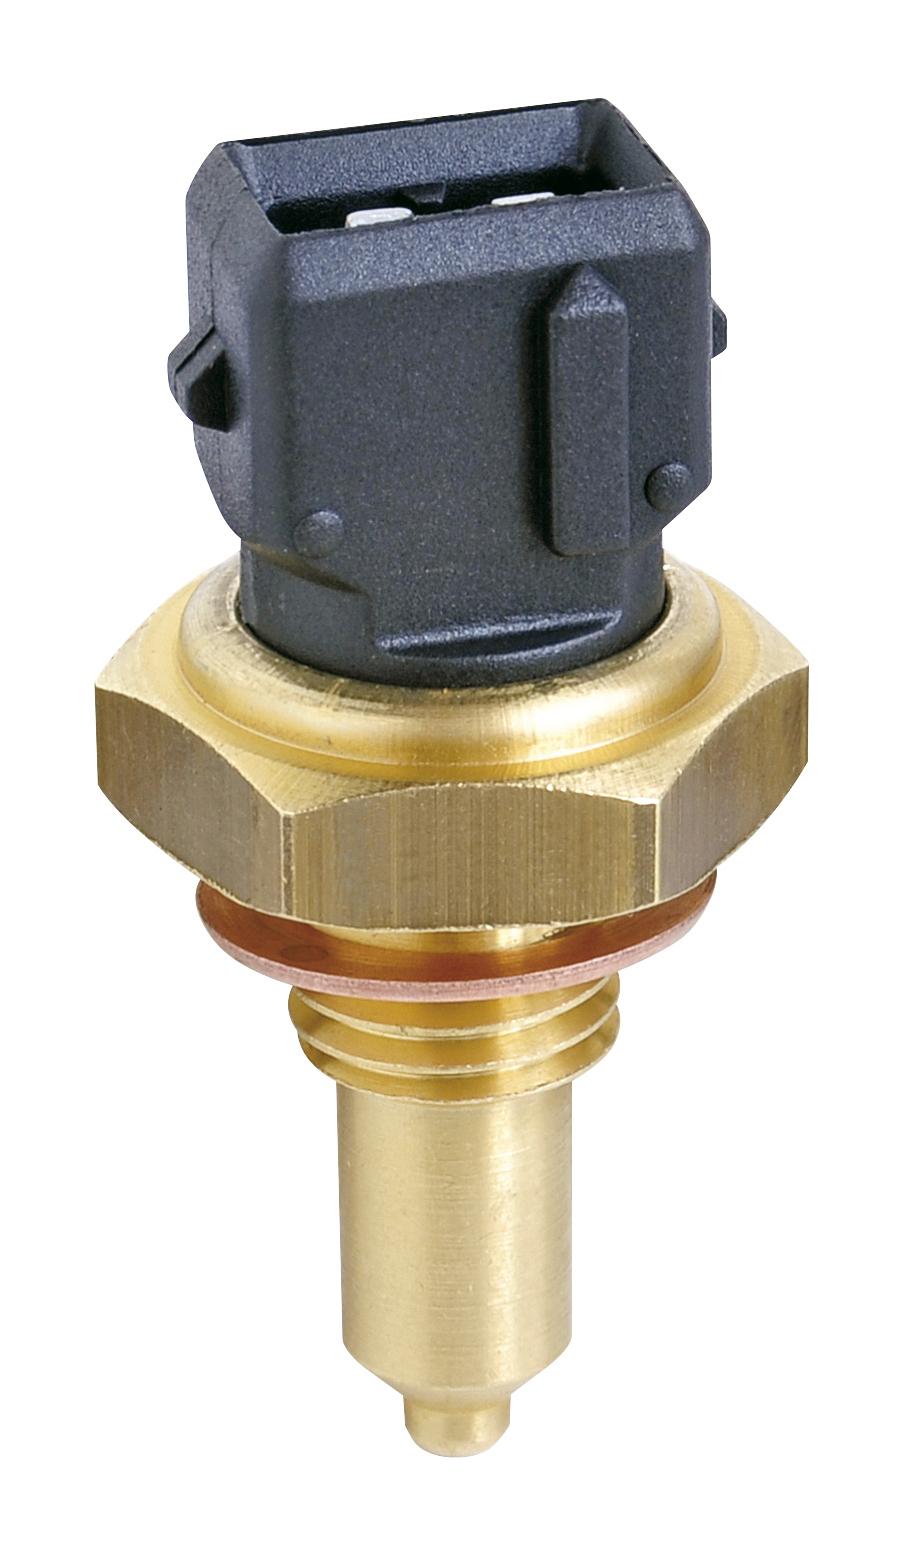 2004 Bmw 525i Engine Coolant Temperature Sensor Expansion Tank Hl 009107941